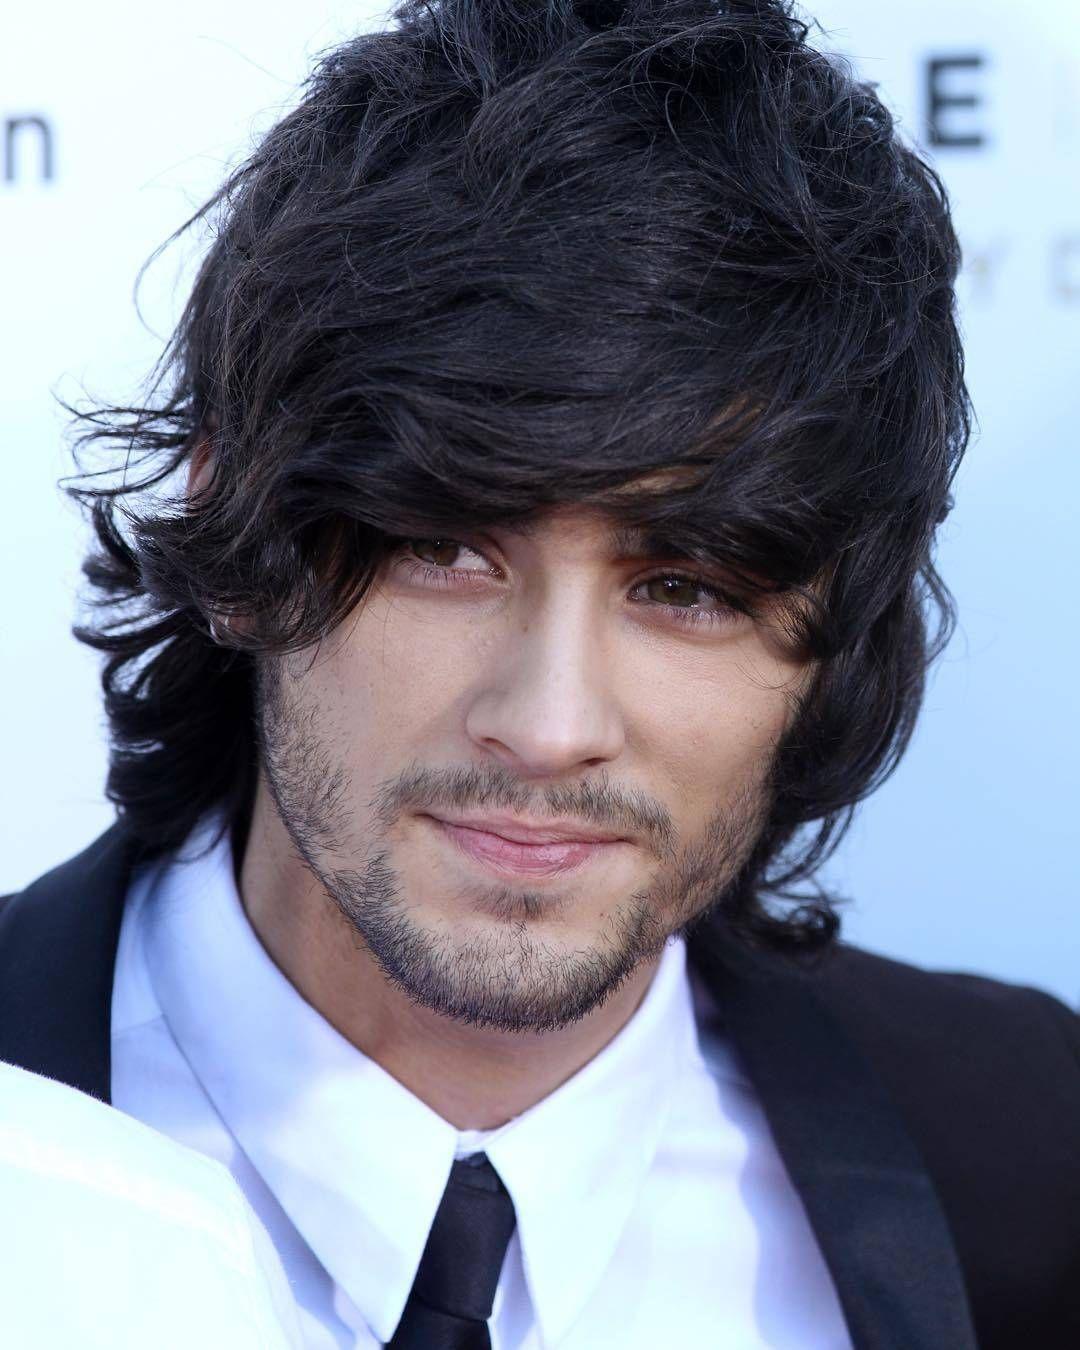 Best Zayn Malik Long Hair Style Pic Zayn Malik Hairstyle Hairstyles Zayn Zayn